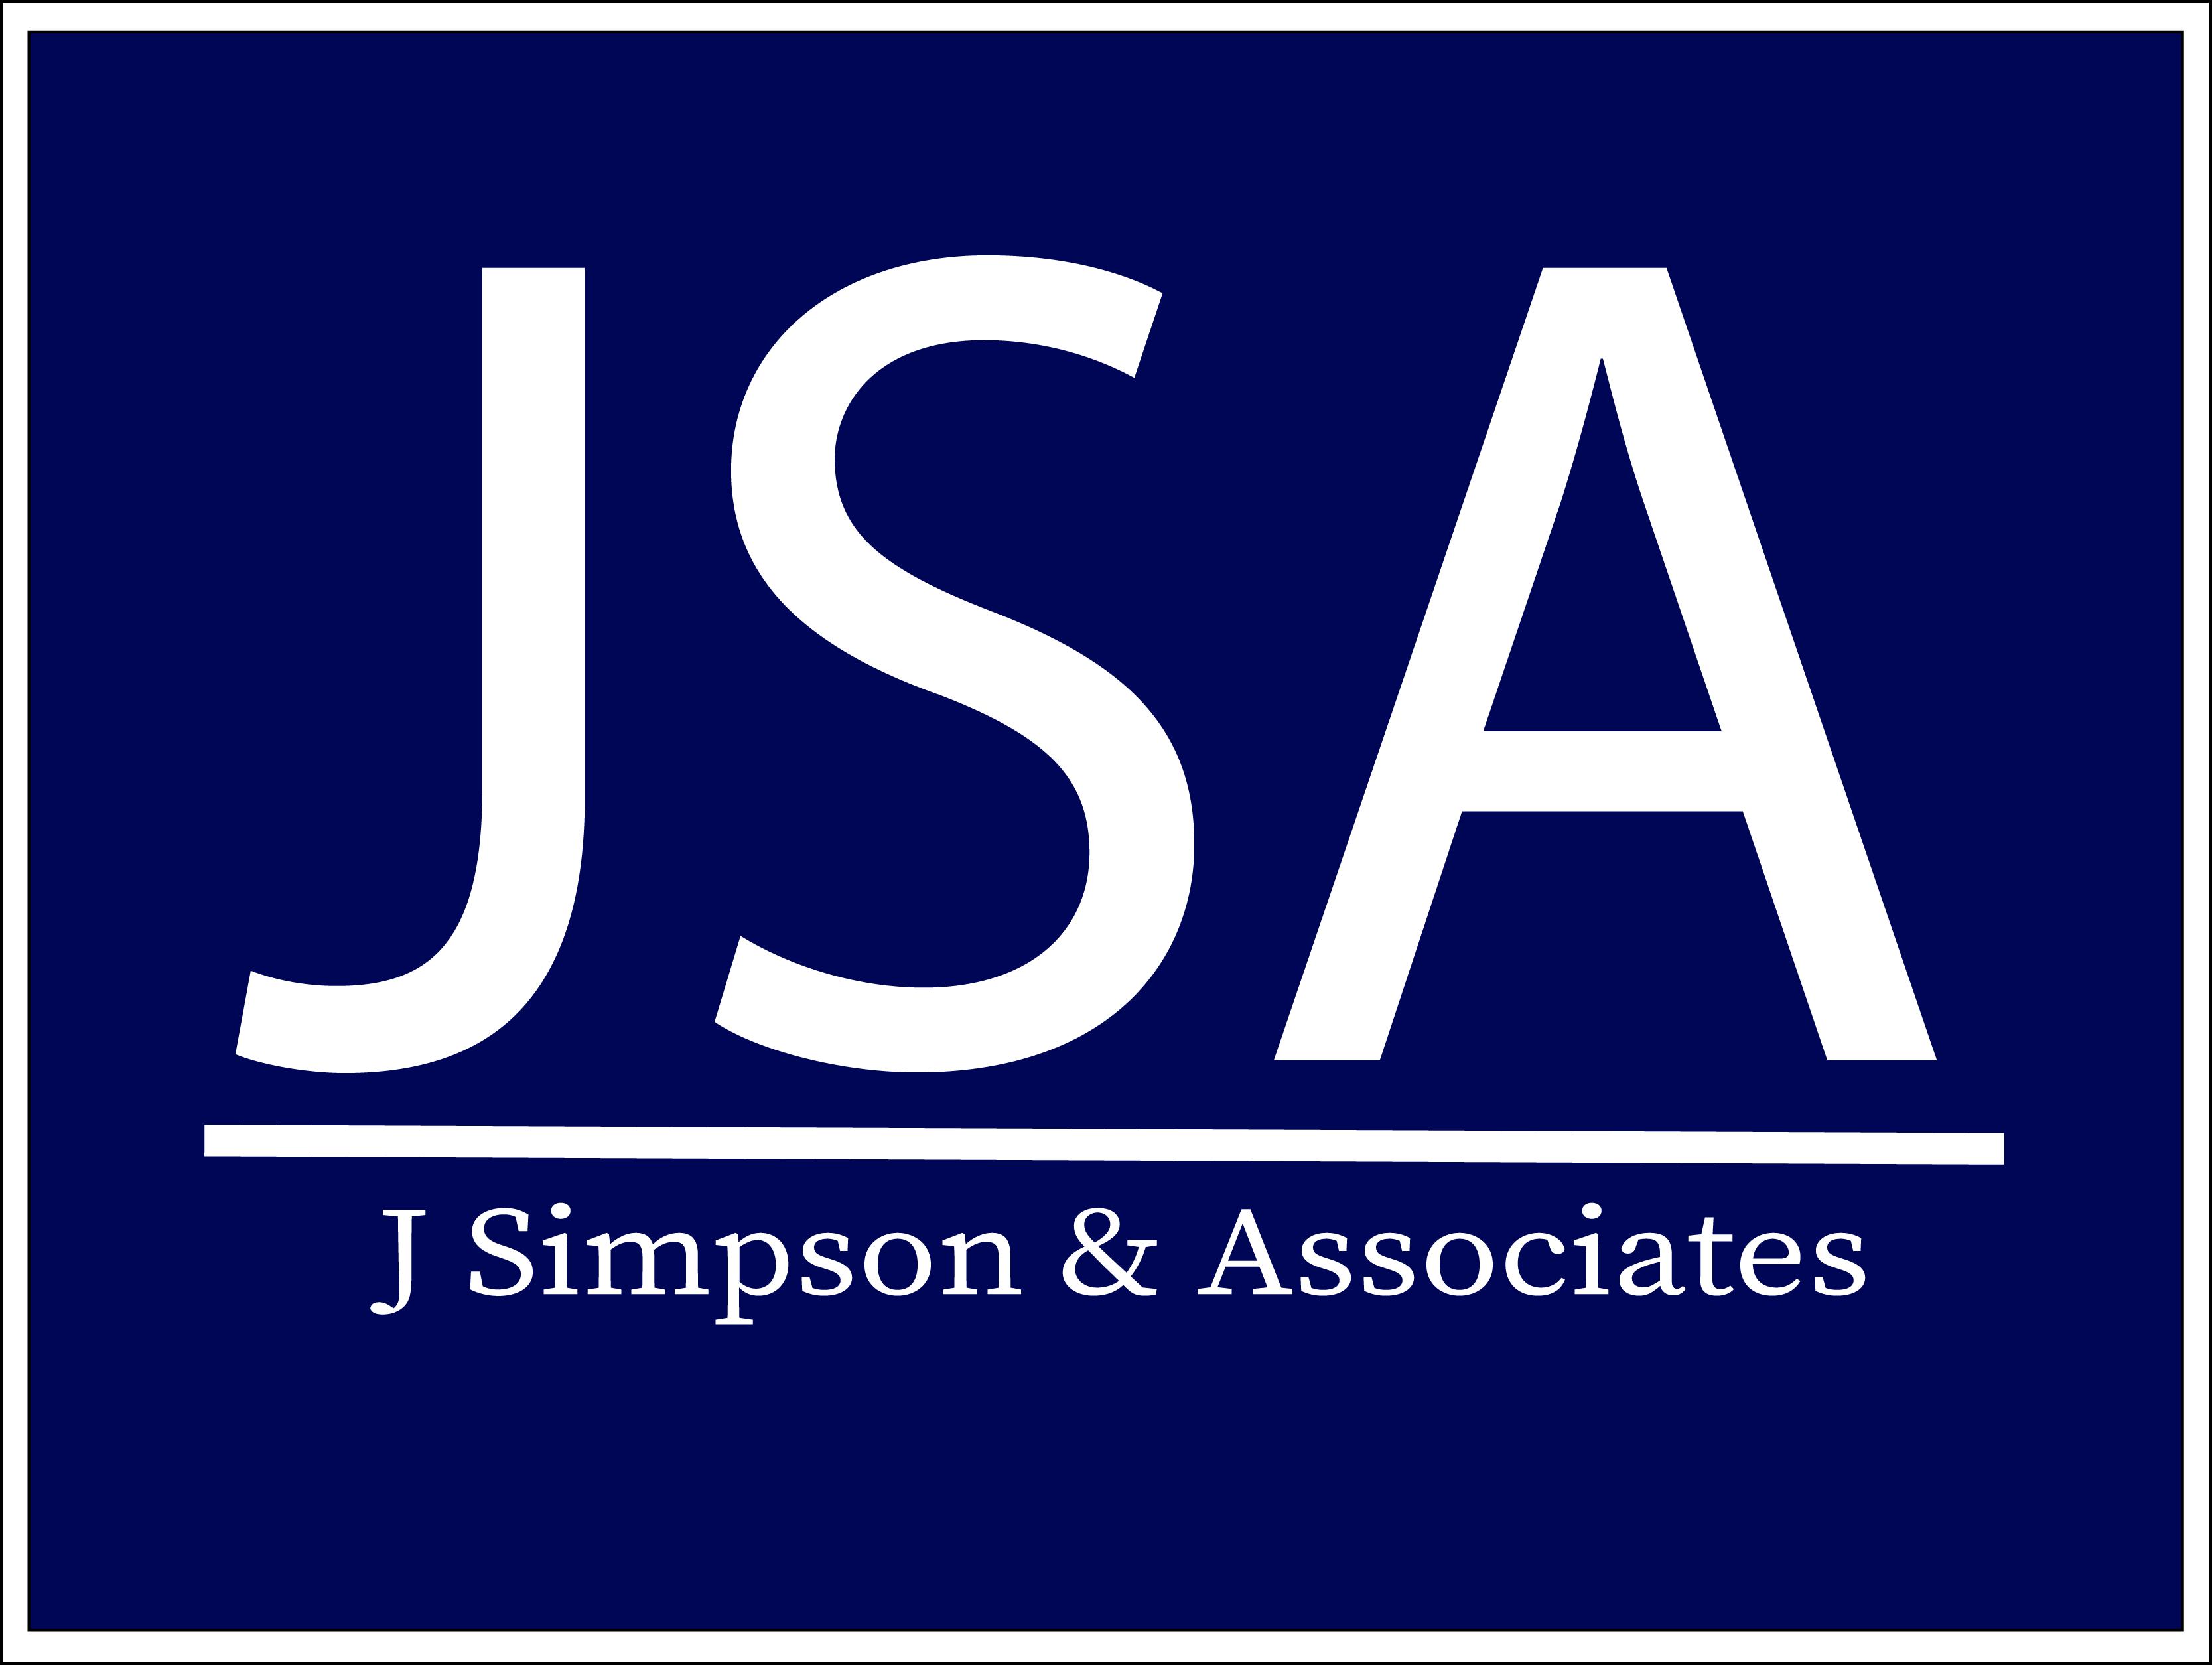 J. Simpson & Associates